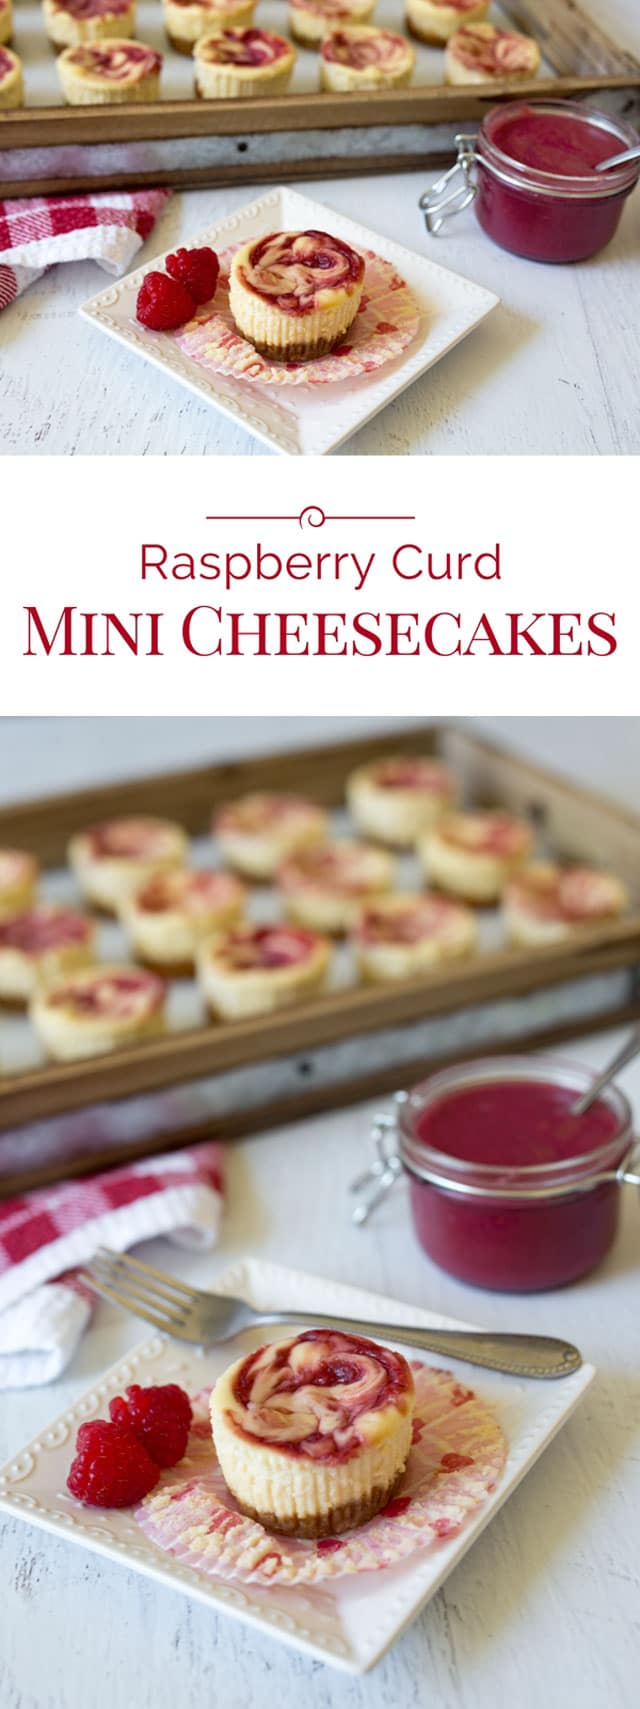 Raspberry-Curd-Mini-Cheesecakes-Collage-Barbara-Bakes